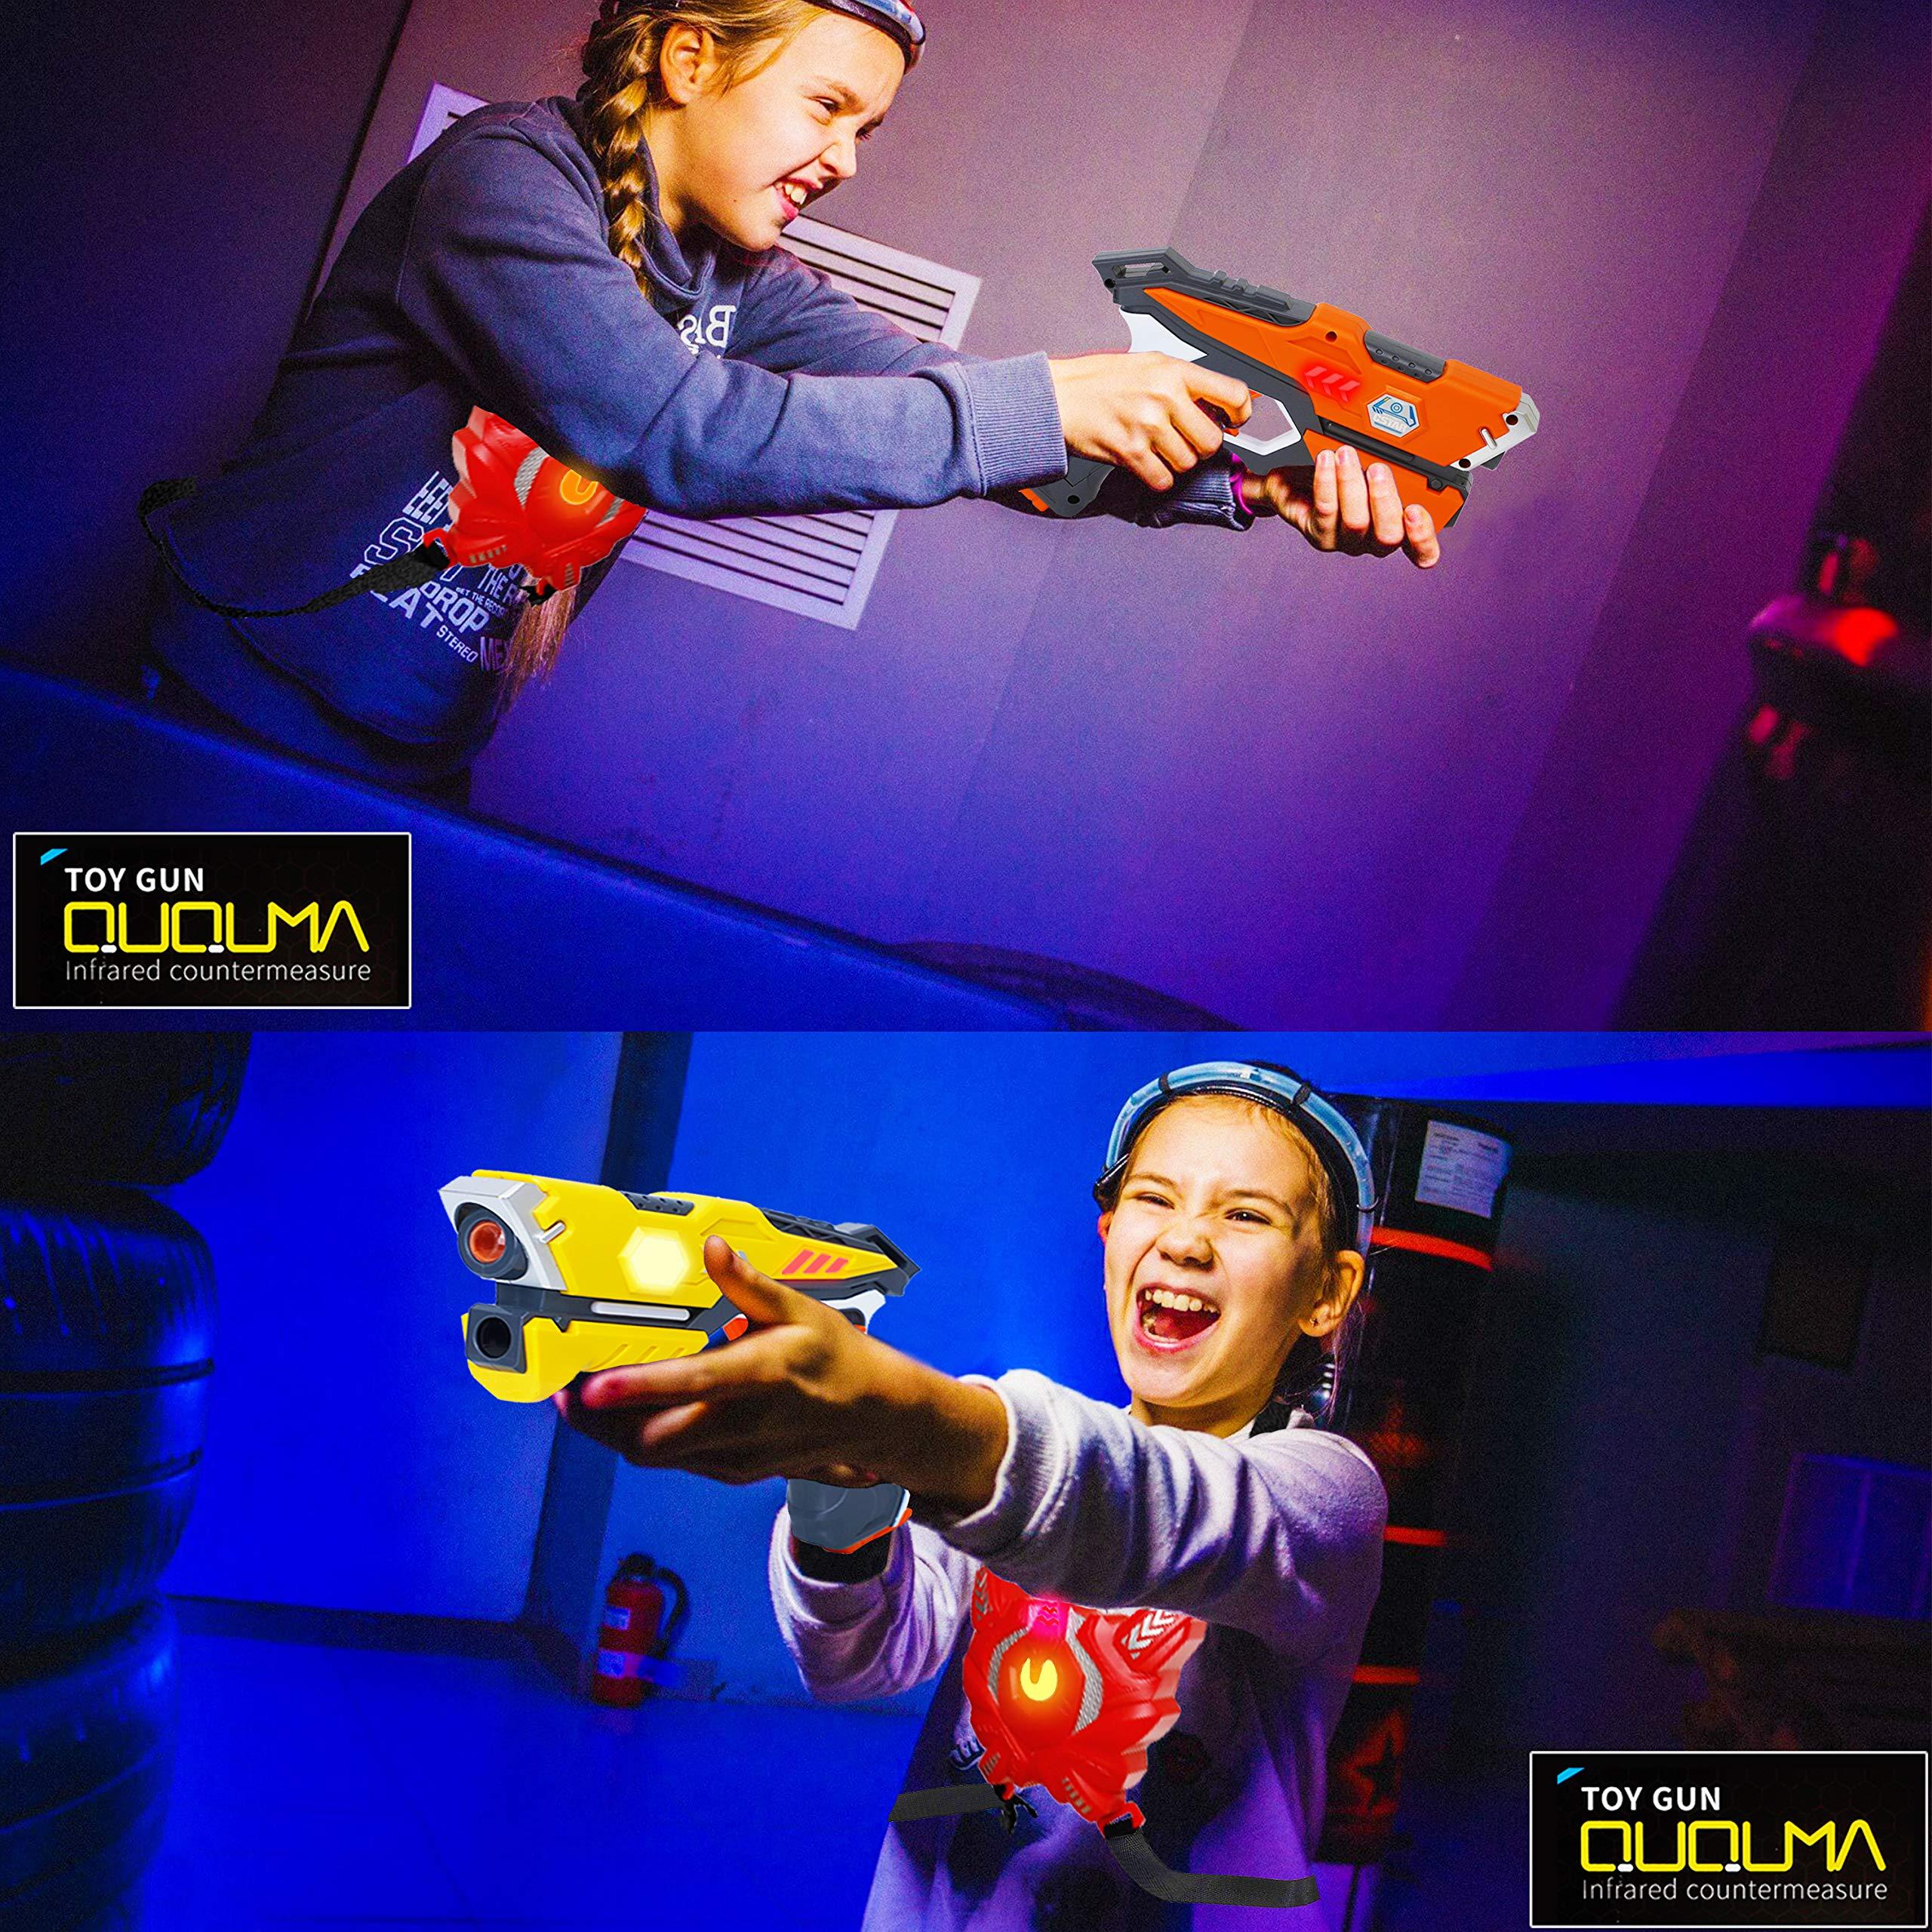 QUQUMA Infrared Laser Tag Set 4 Guns 4 Vests - Indoor Outdoor Laser Gun Kit Toy for Girl & Boy Laser Tag Game Set Best Gift Boys Girls(Laser Guns) by QUQUMA (Image #2)